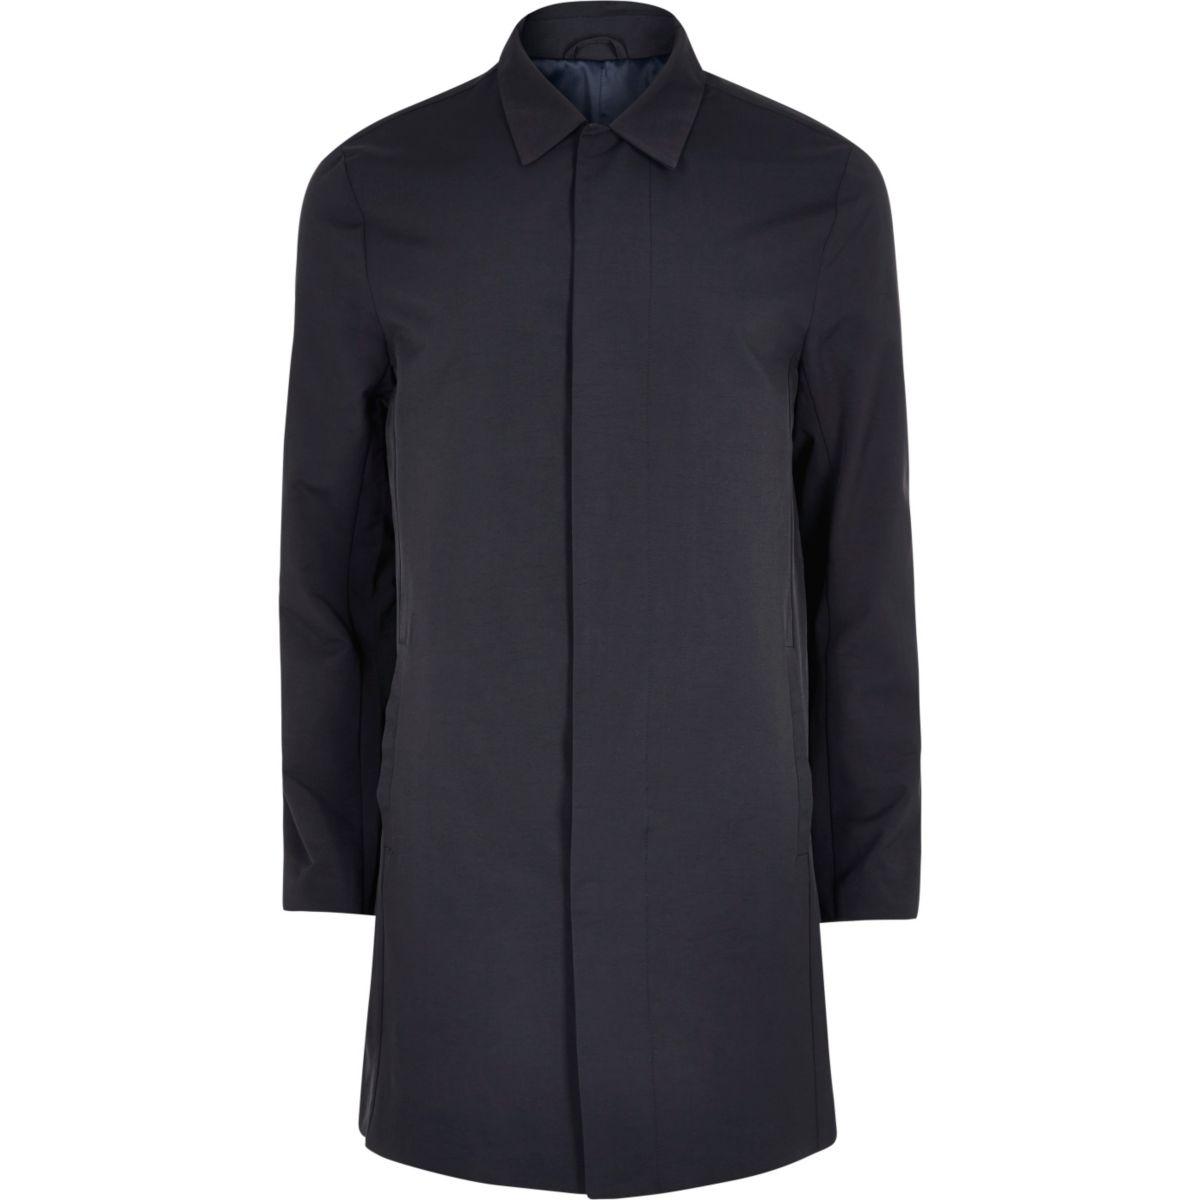 Navy smart mac coat - Coats & Jackets - Sale - men